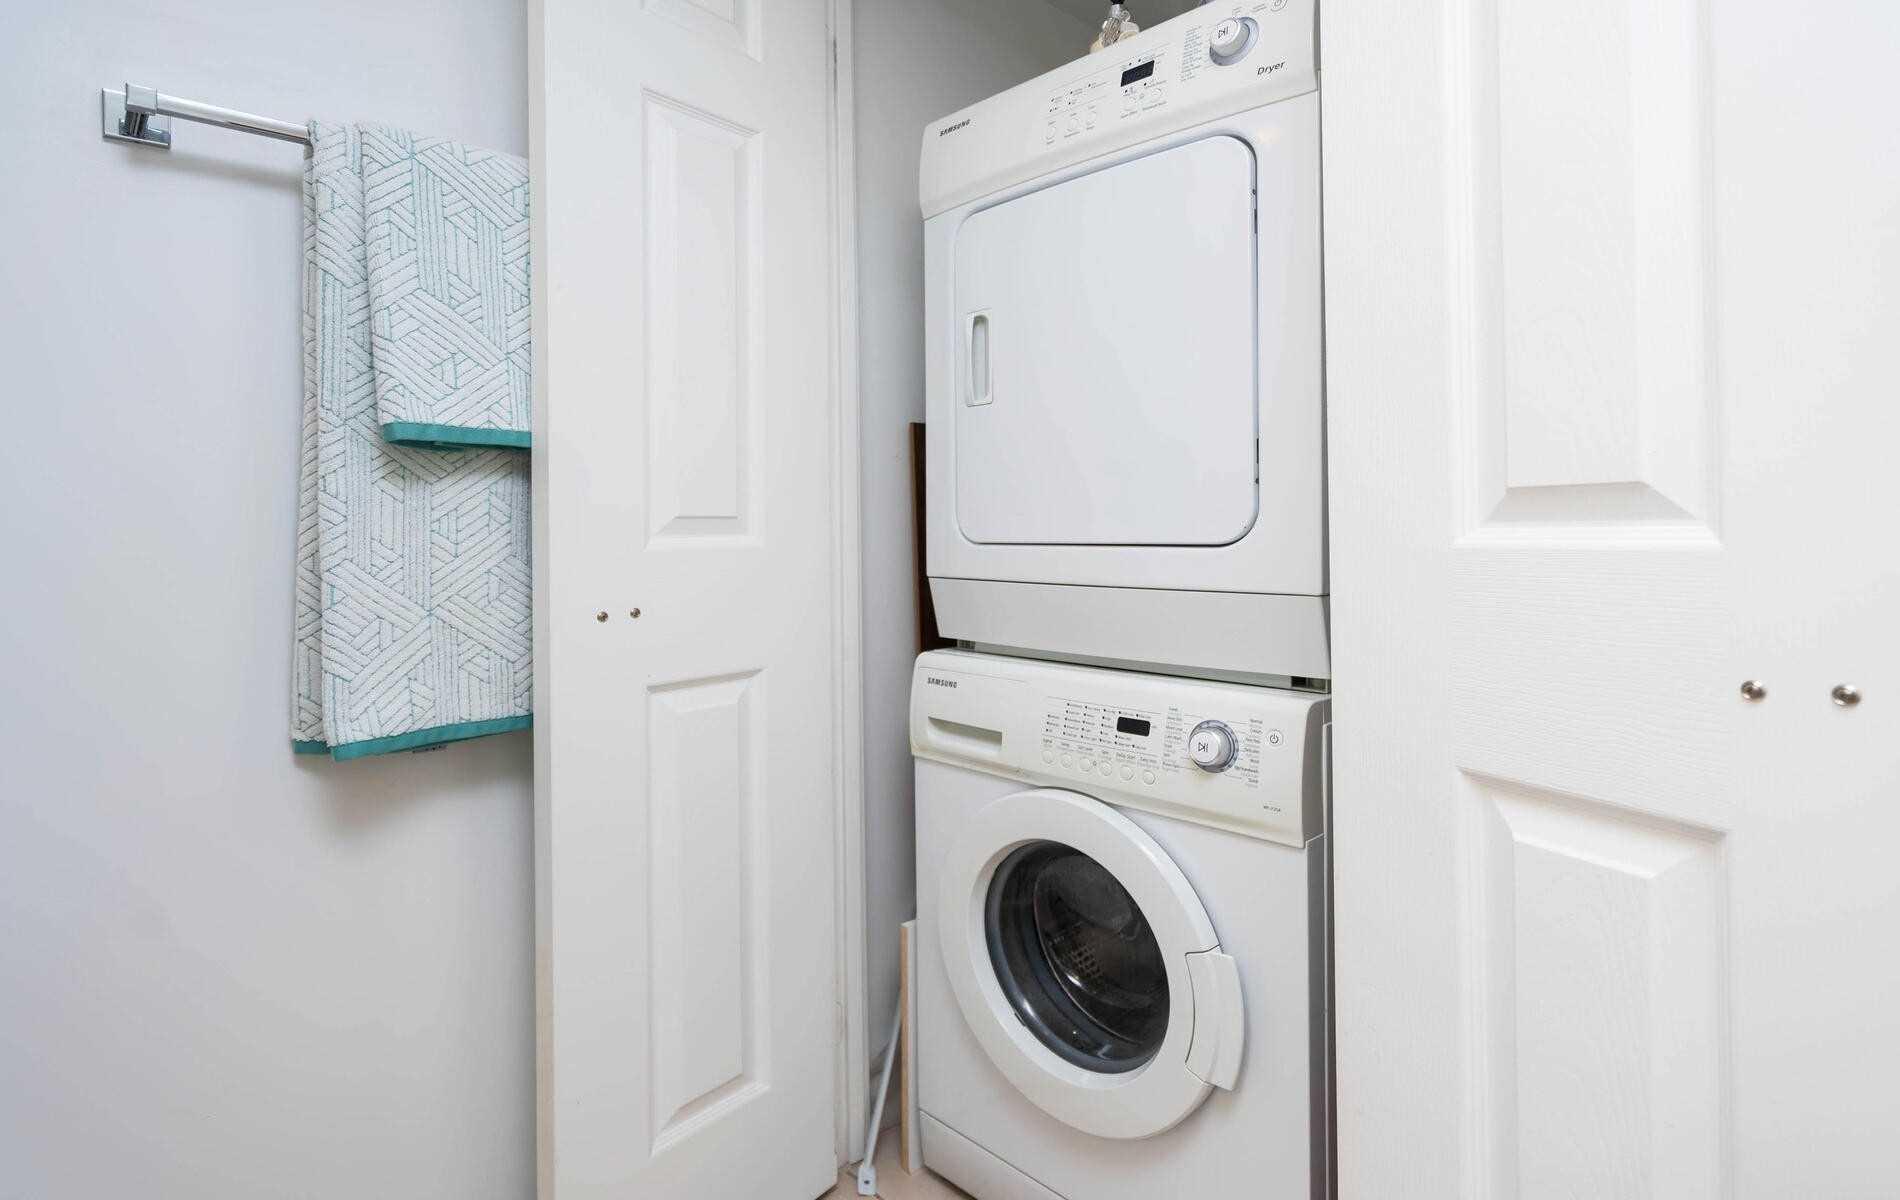 120 Dallimore Circ. 402 - Laundry